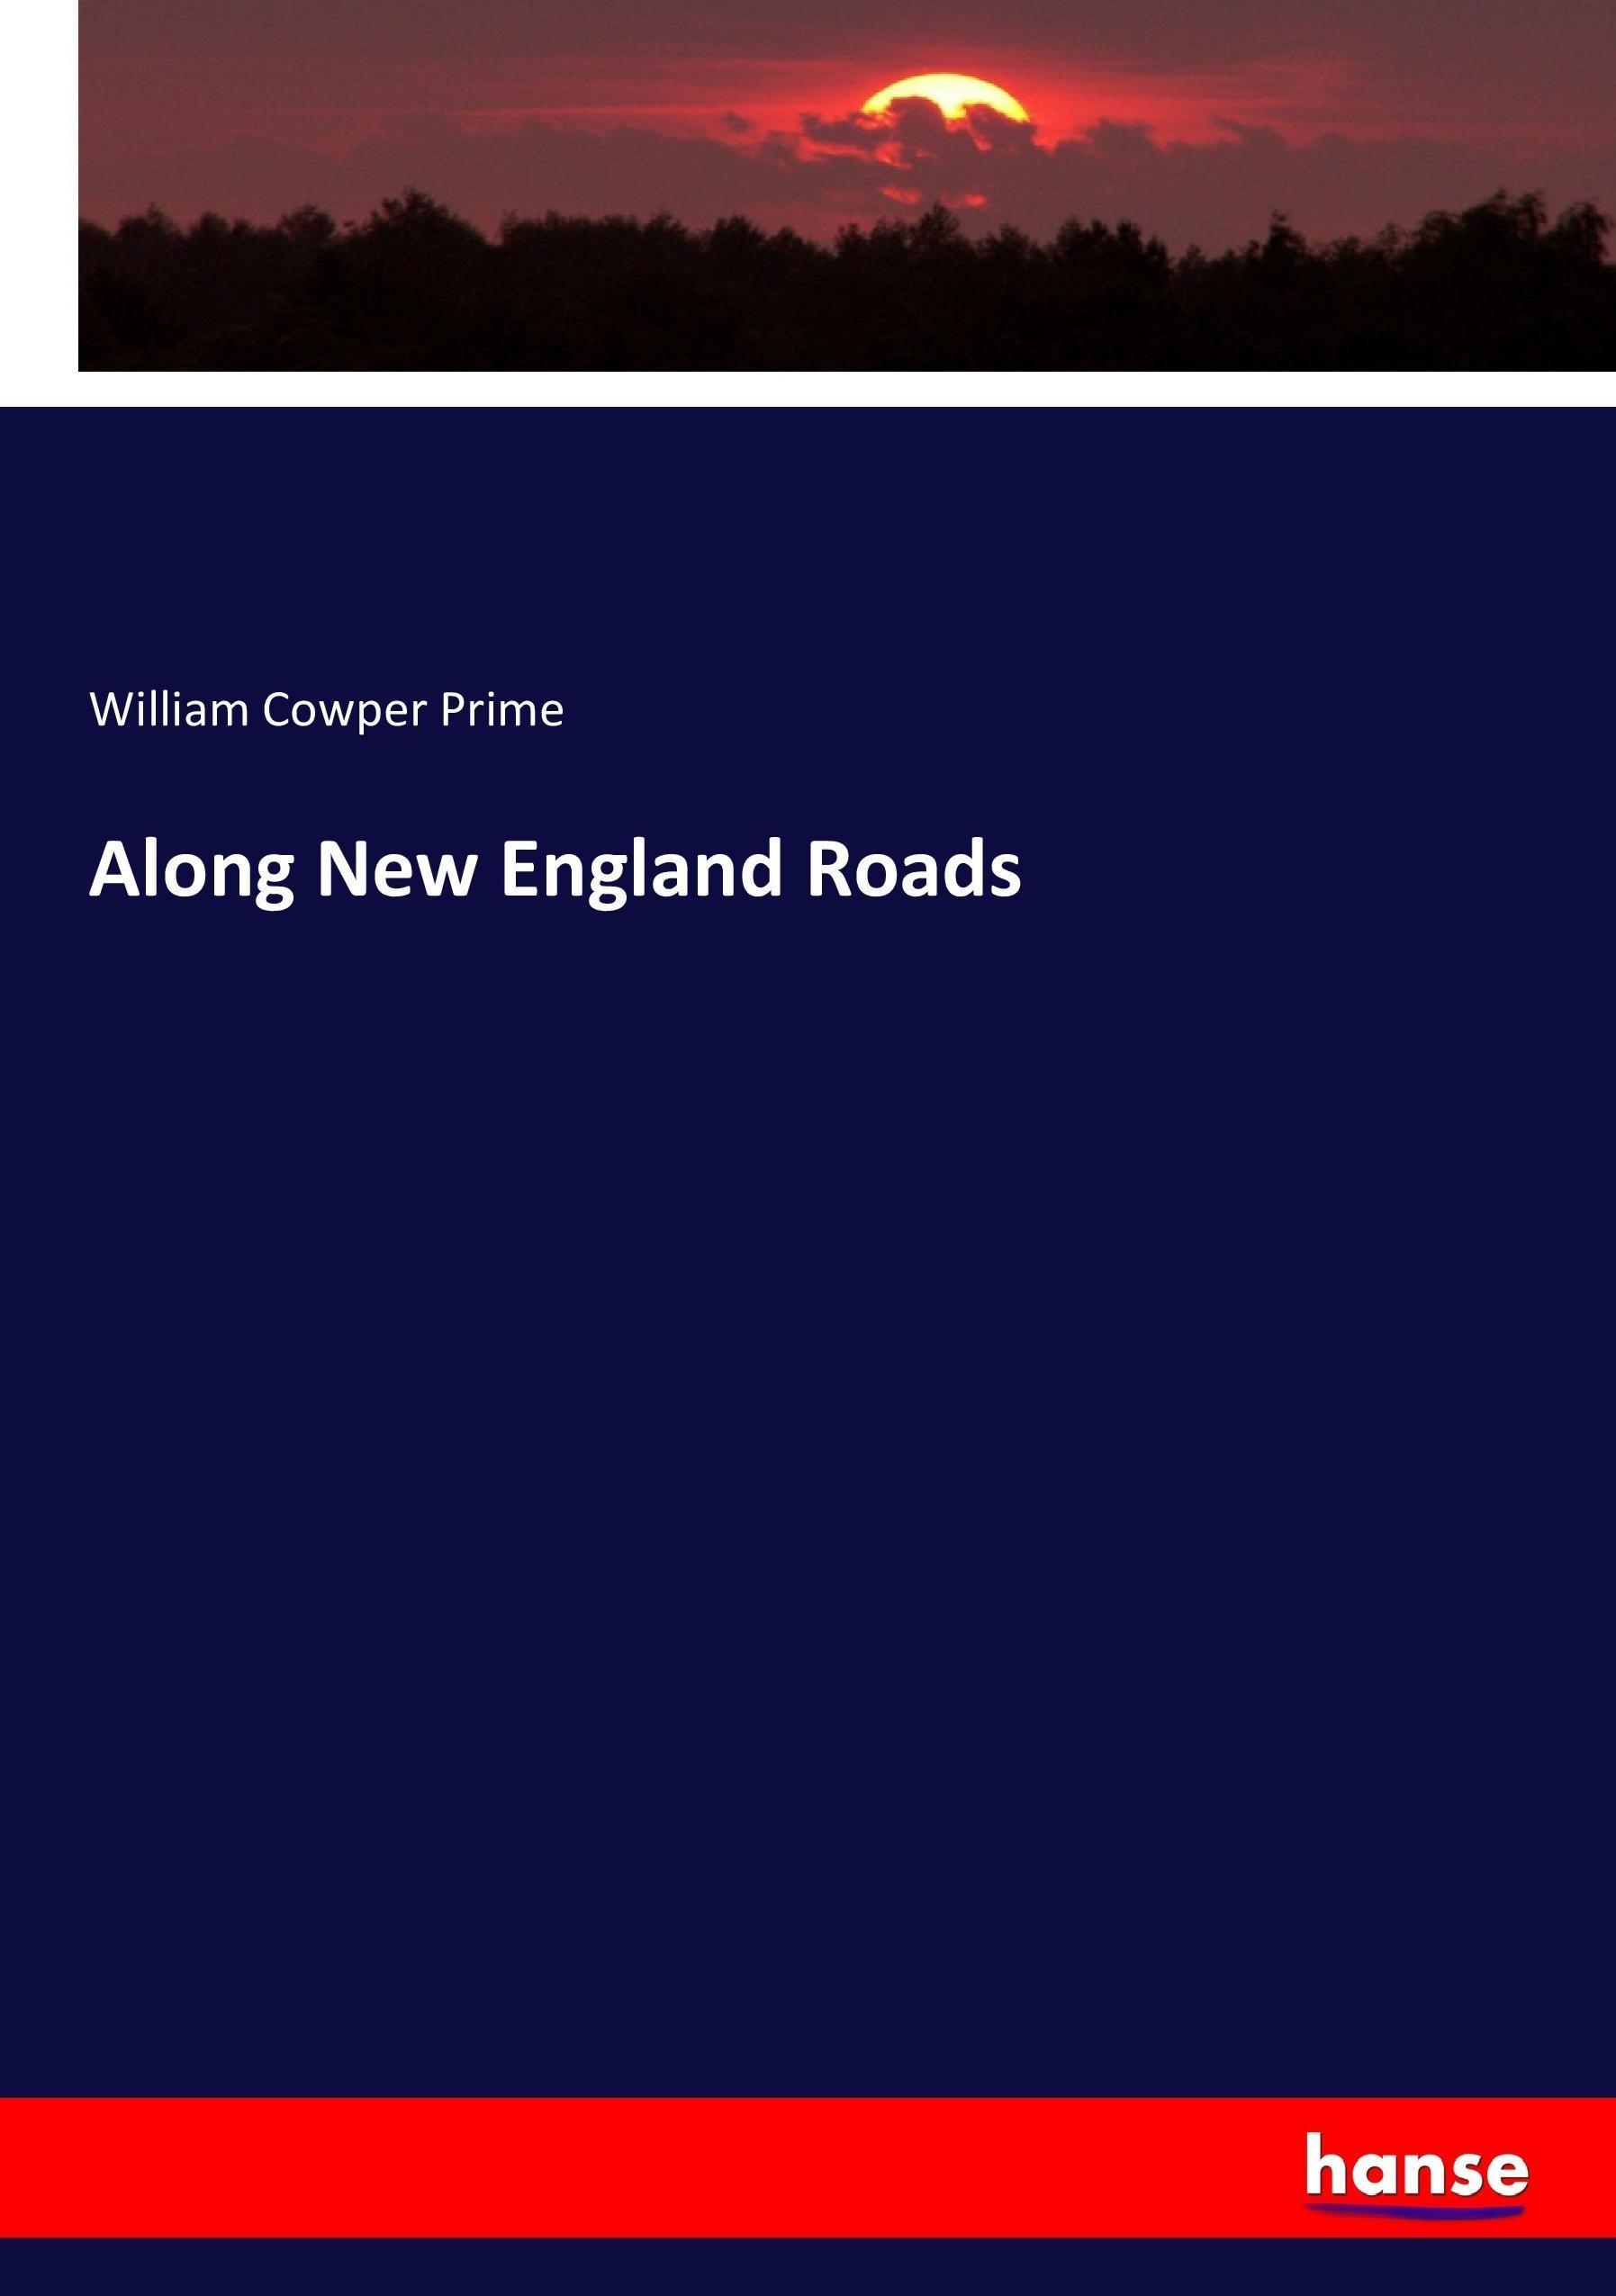 Along New England Roads William Cowper Prime